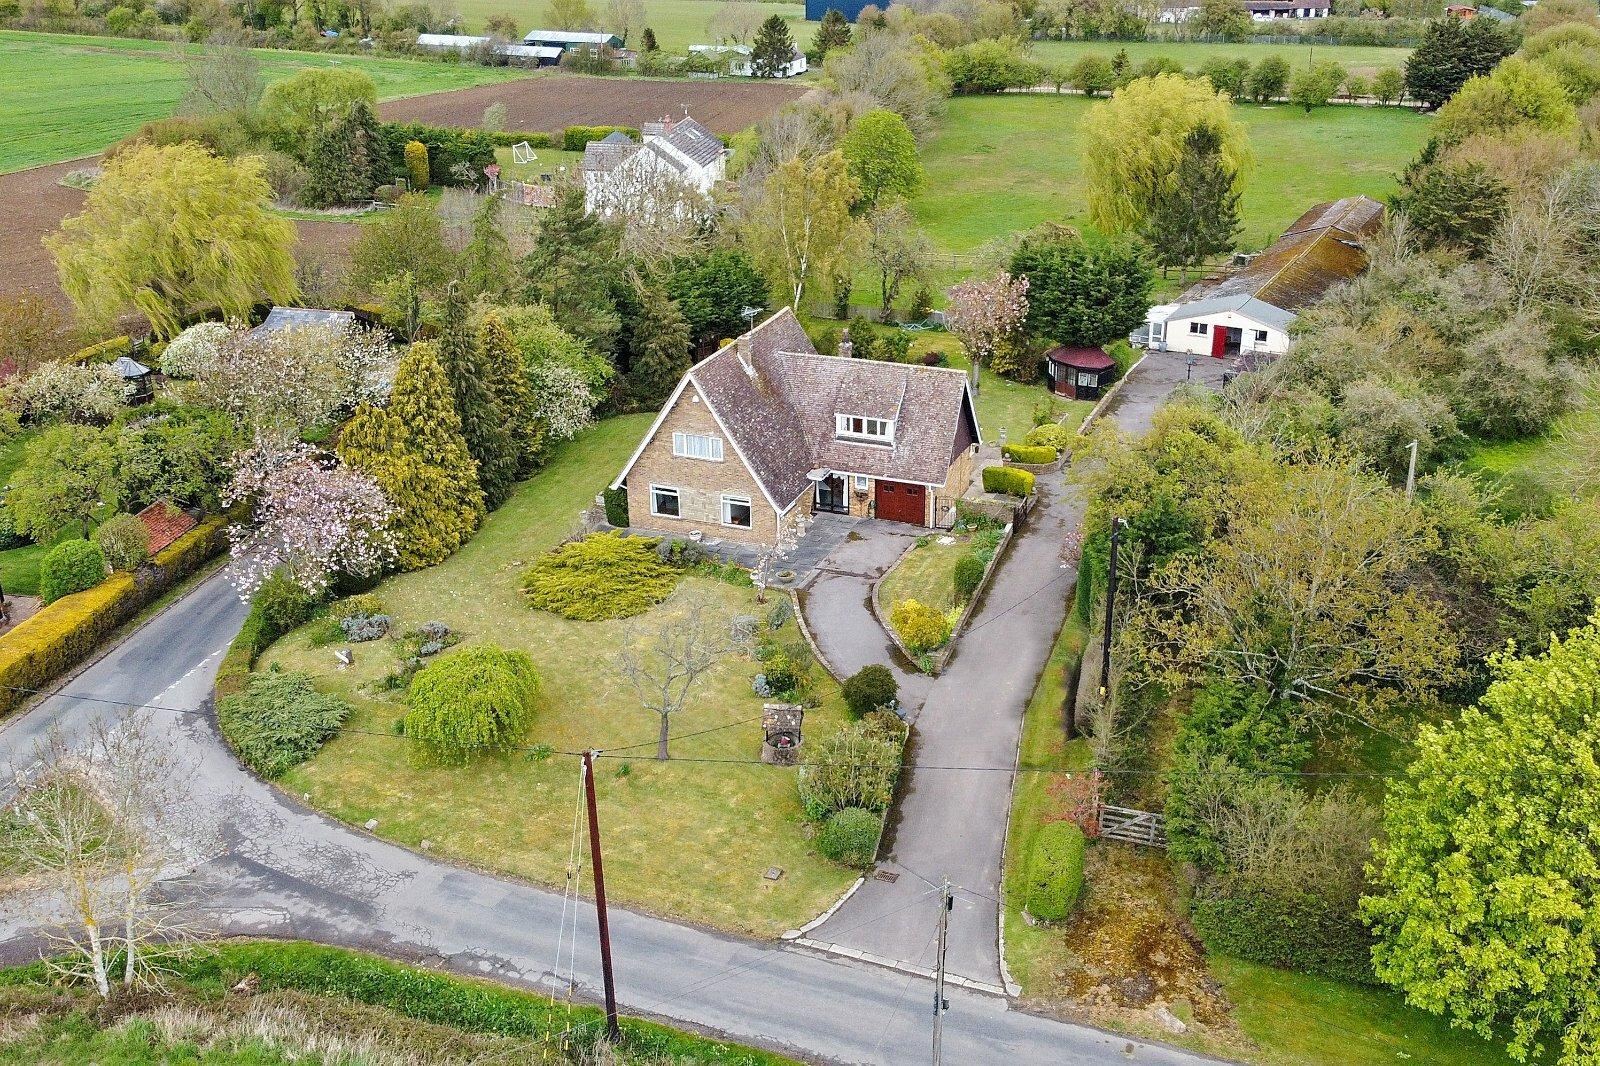 House in Essex, United Kingdom 1